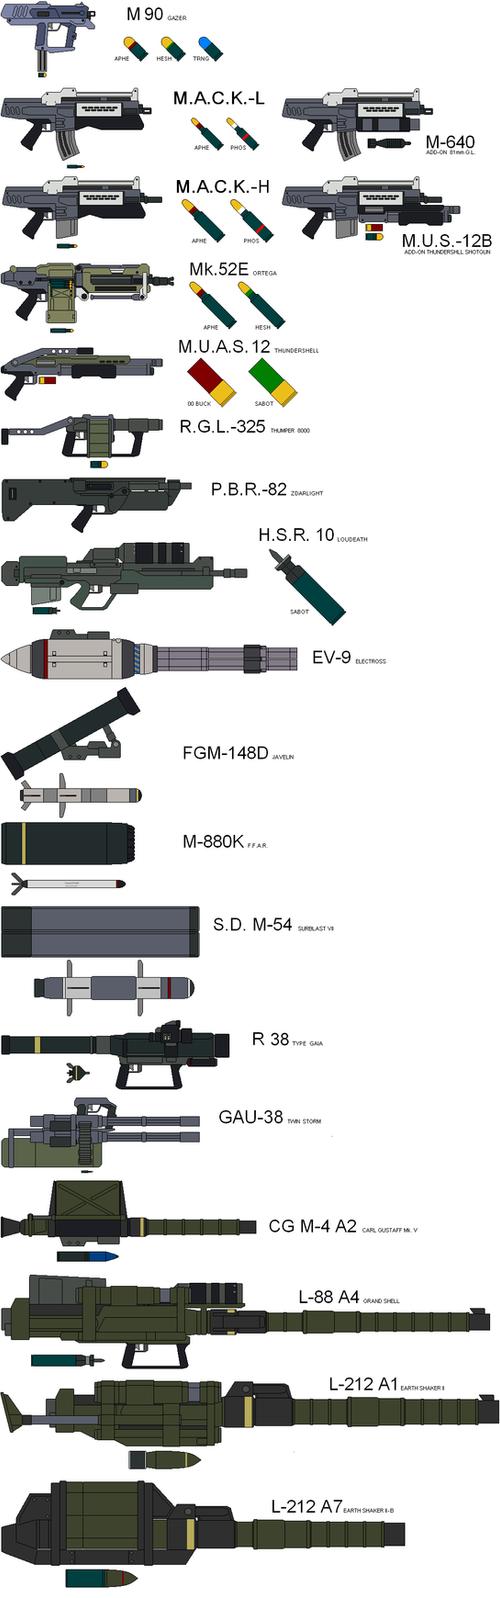 A.M.B.E.R. weapons by IgorKutuzov